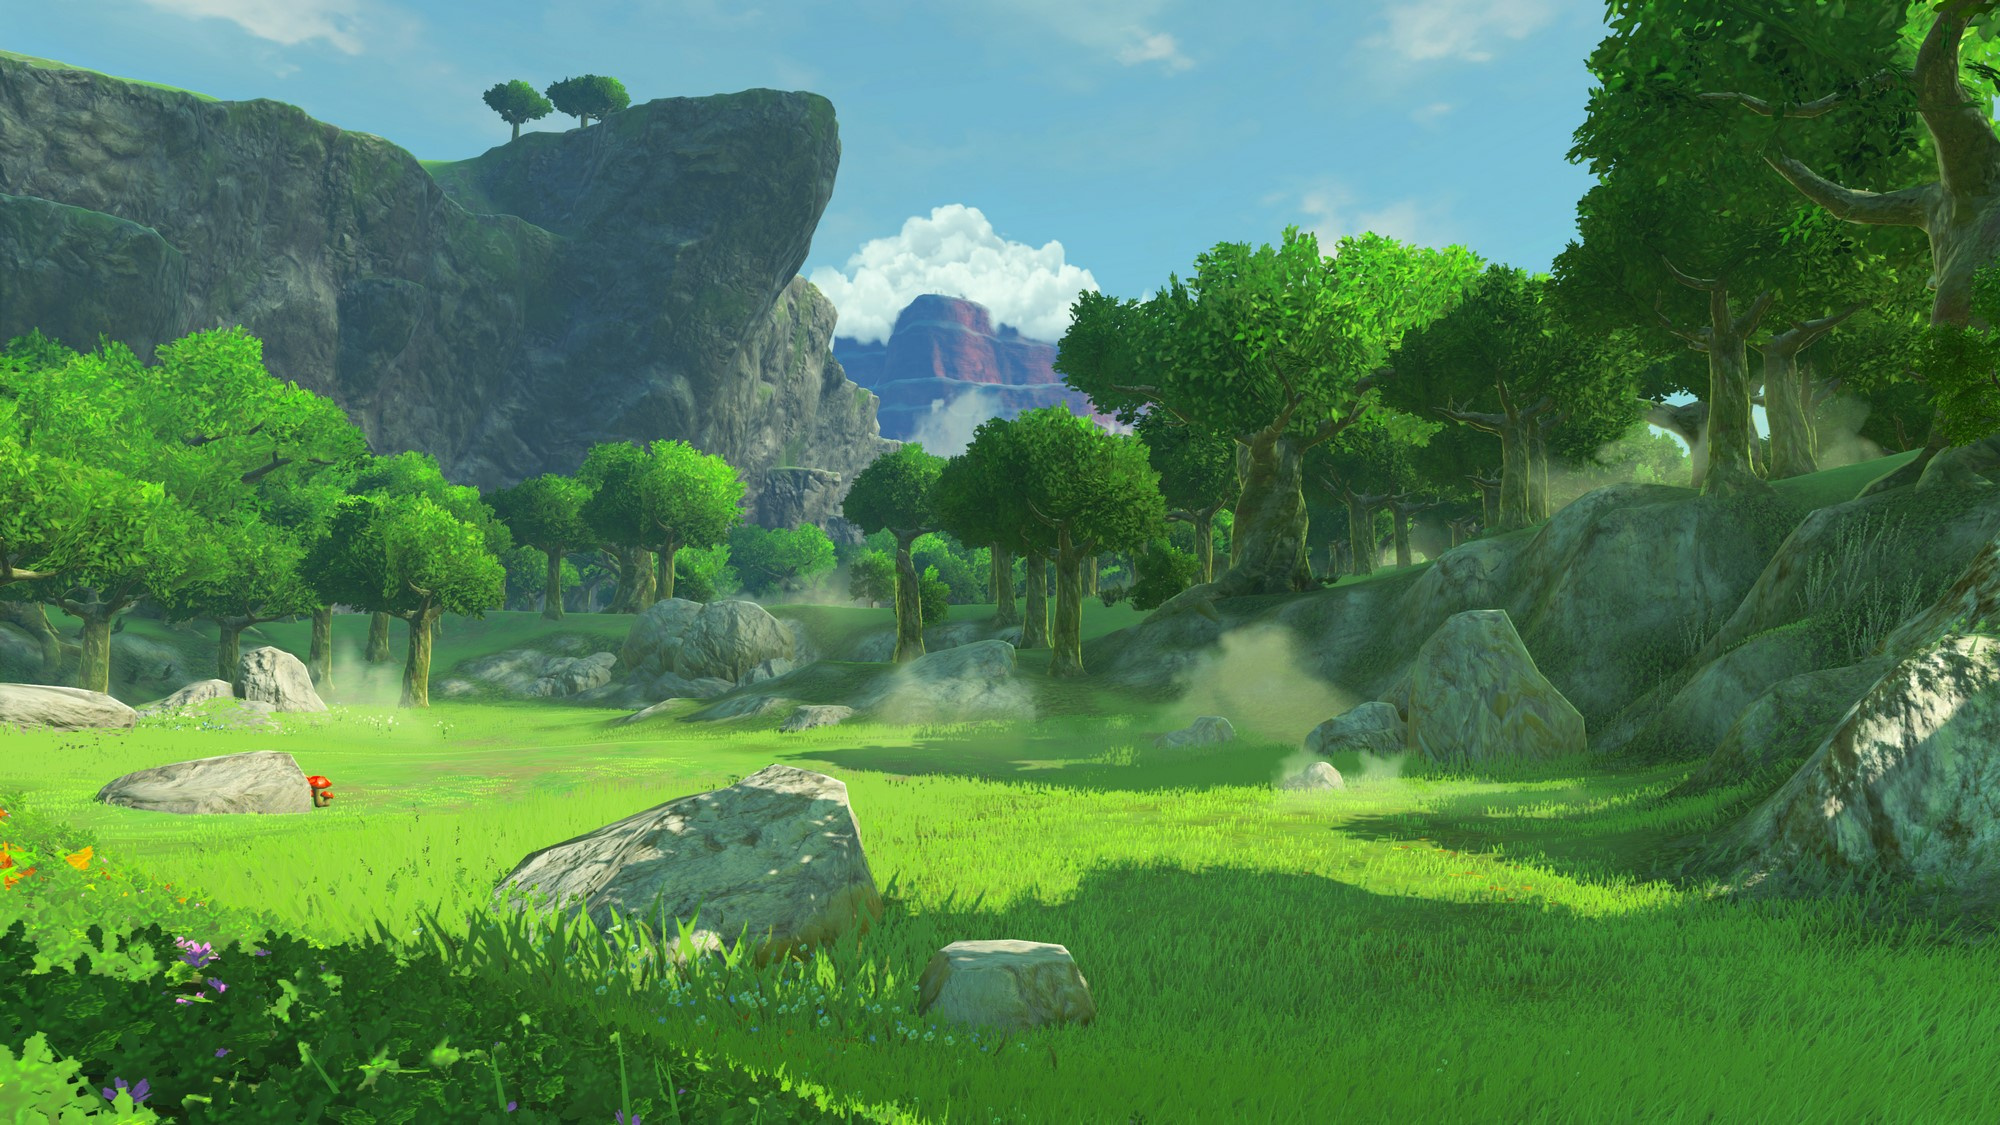 Gallery The Artwork In Legend Of Zelda Breath Of The